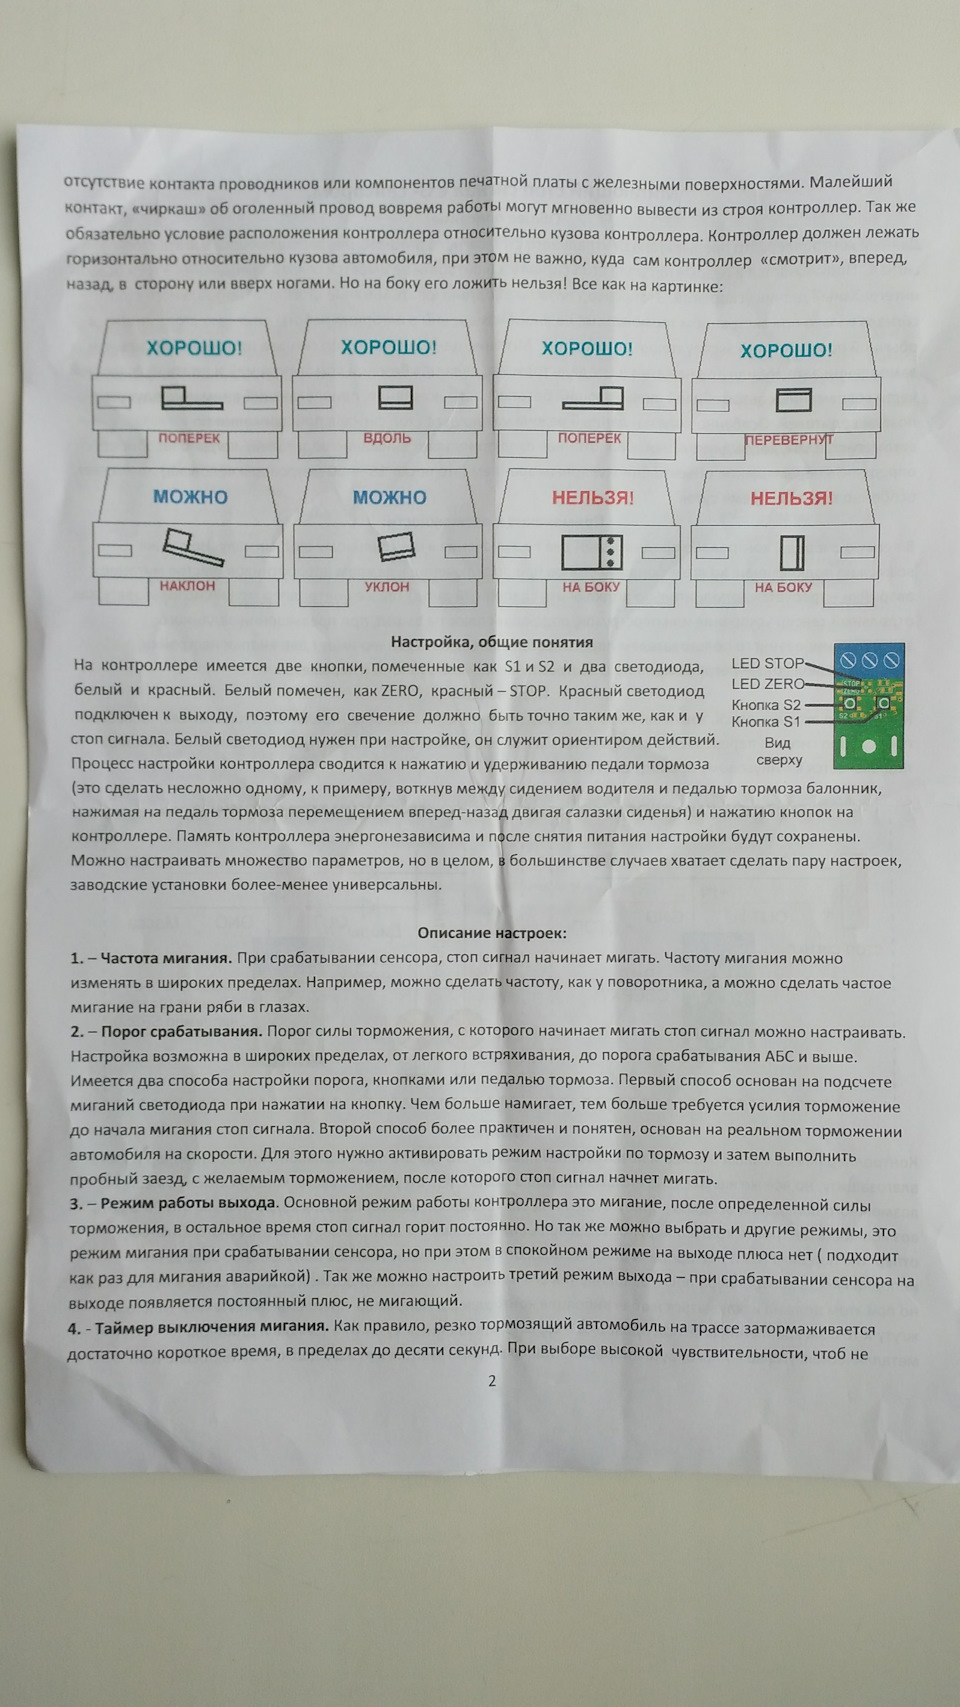 e371715s-960.jpg